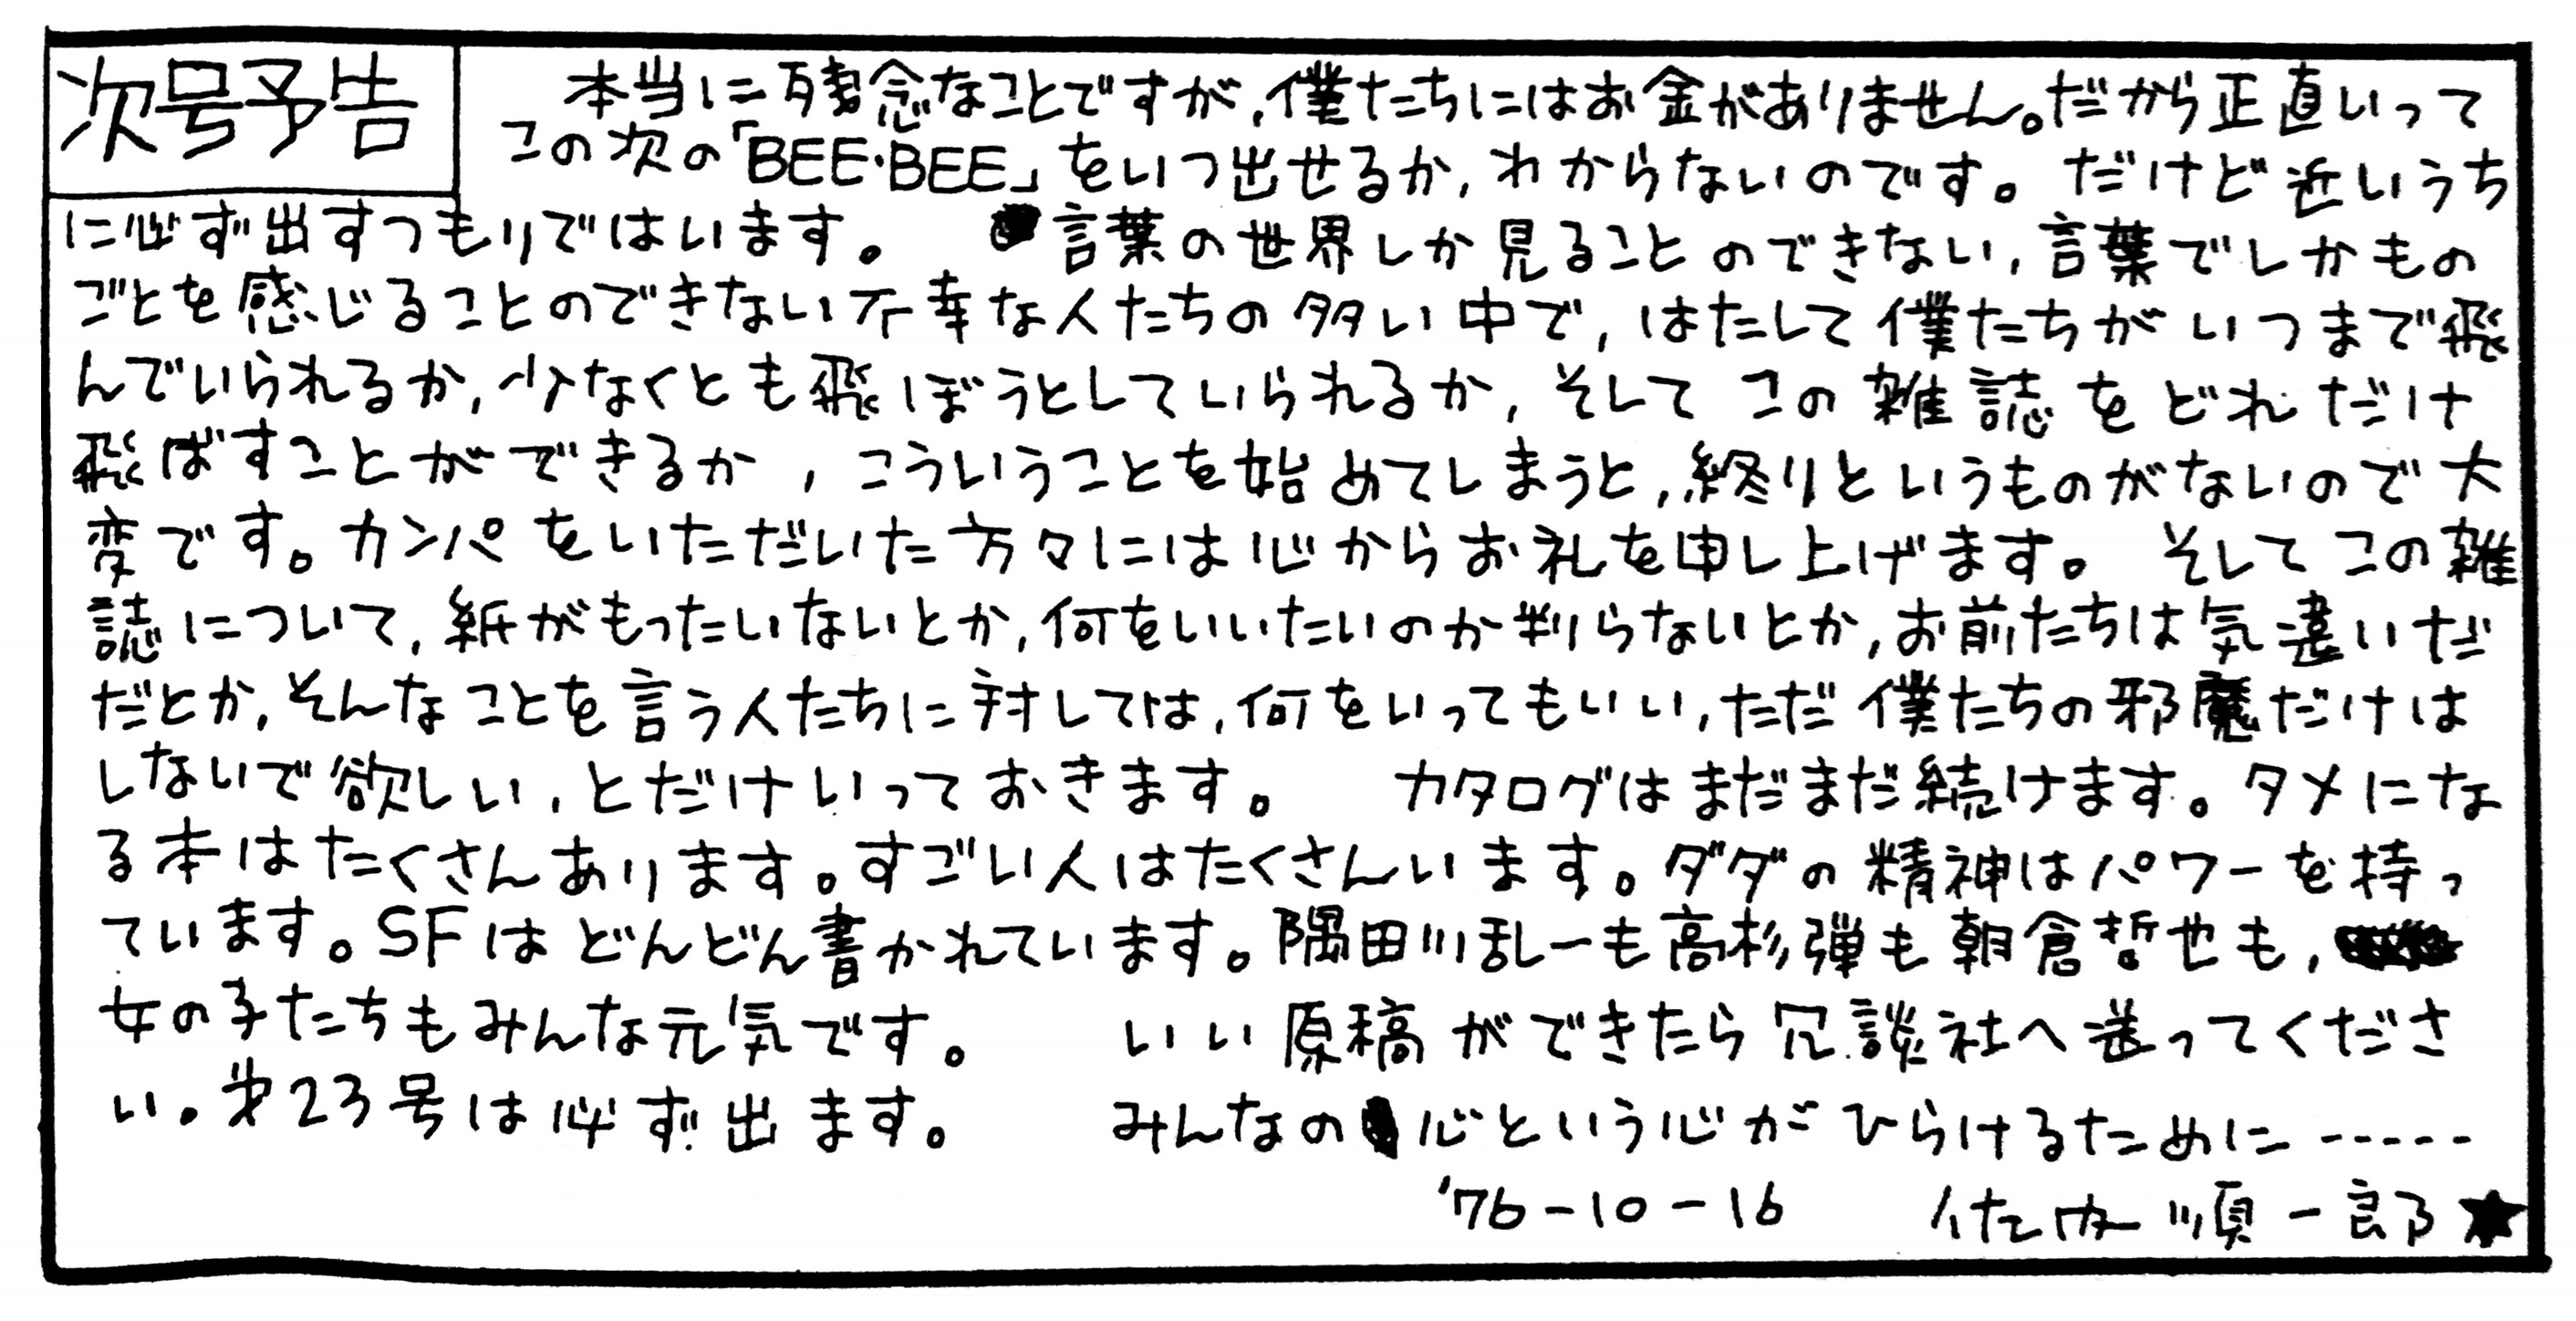 f:id:kougasetumei:20180428231524p:image:w400